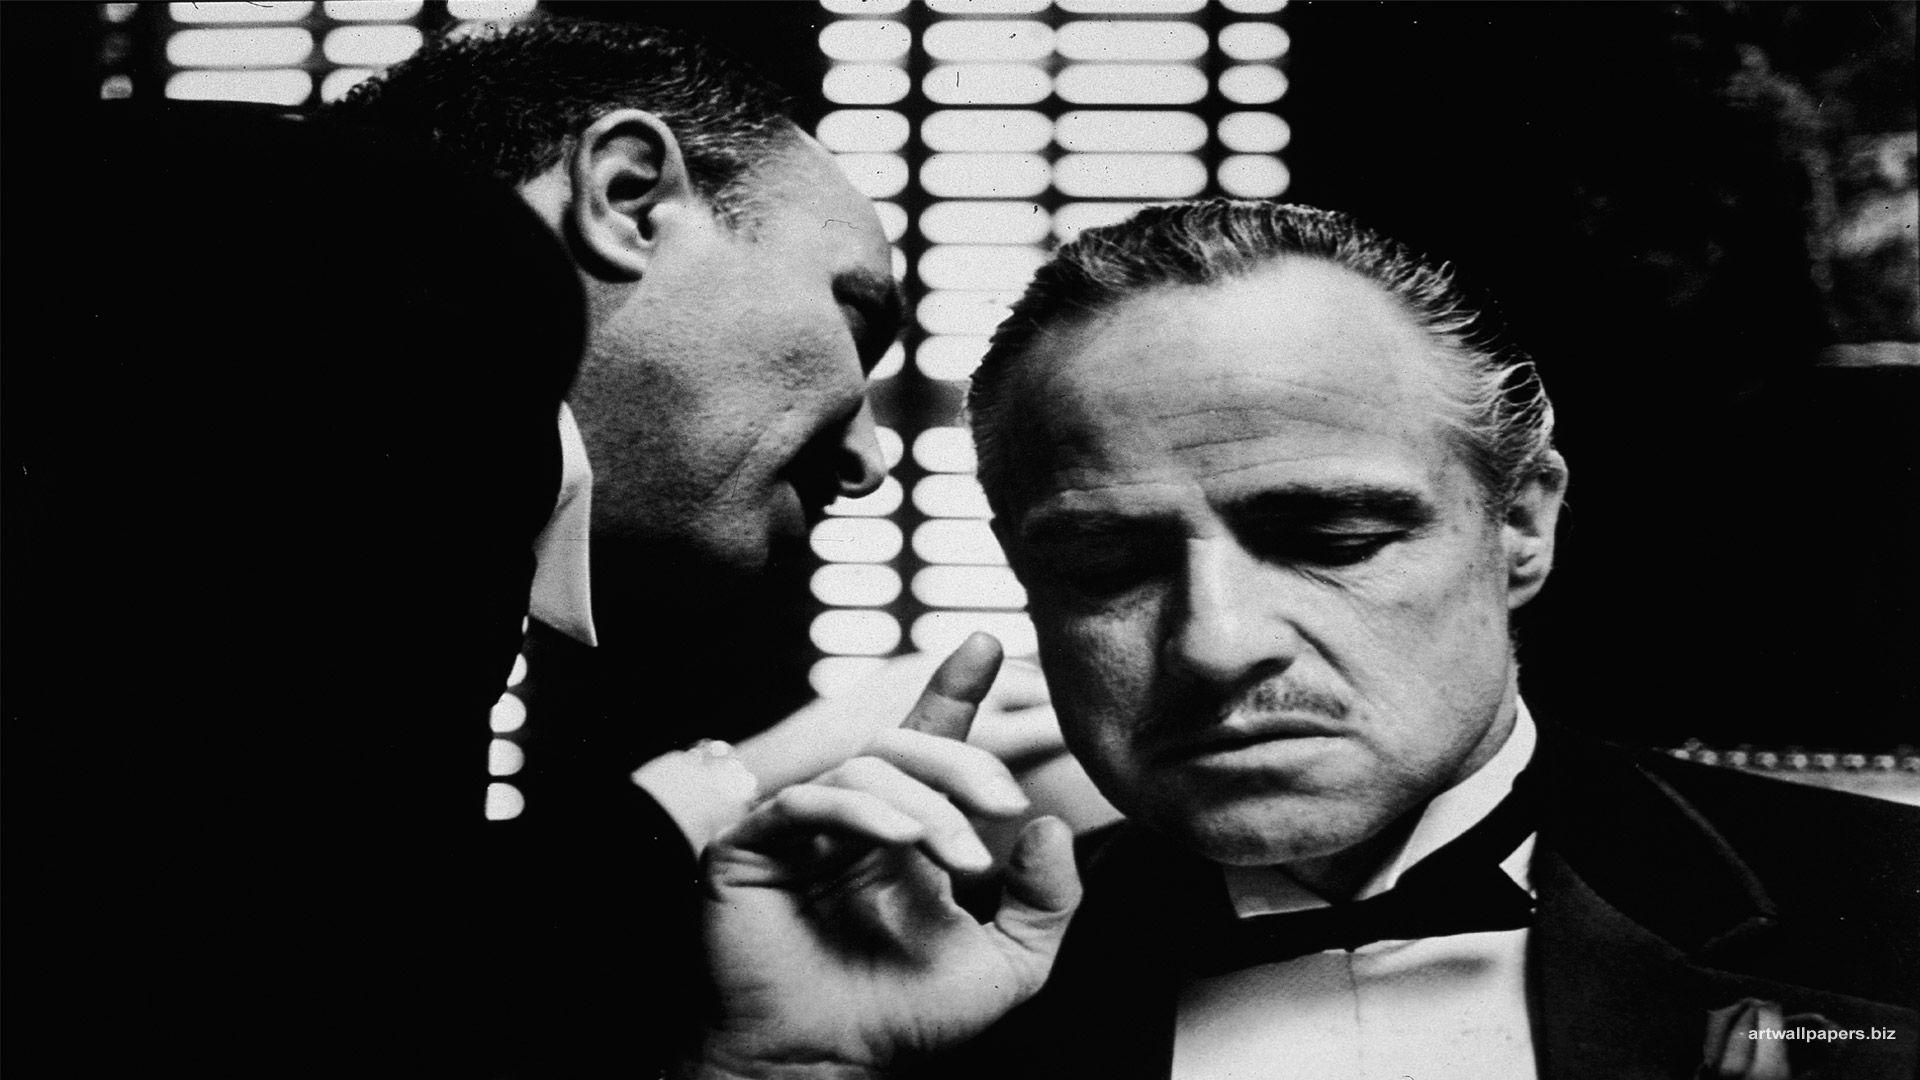 Mind Blowing American Mafia Wallpaper Te   trouble - Marlon Brando Godfather - HD Wallpaper